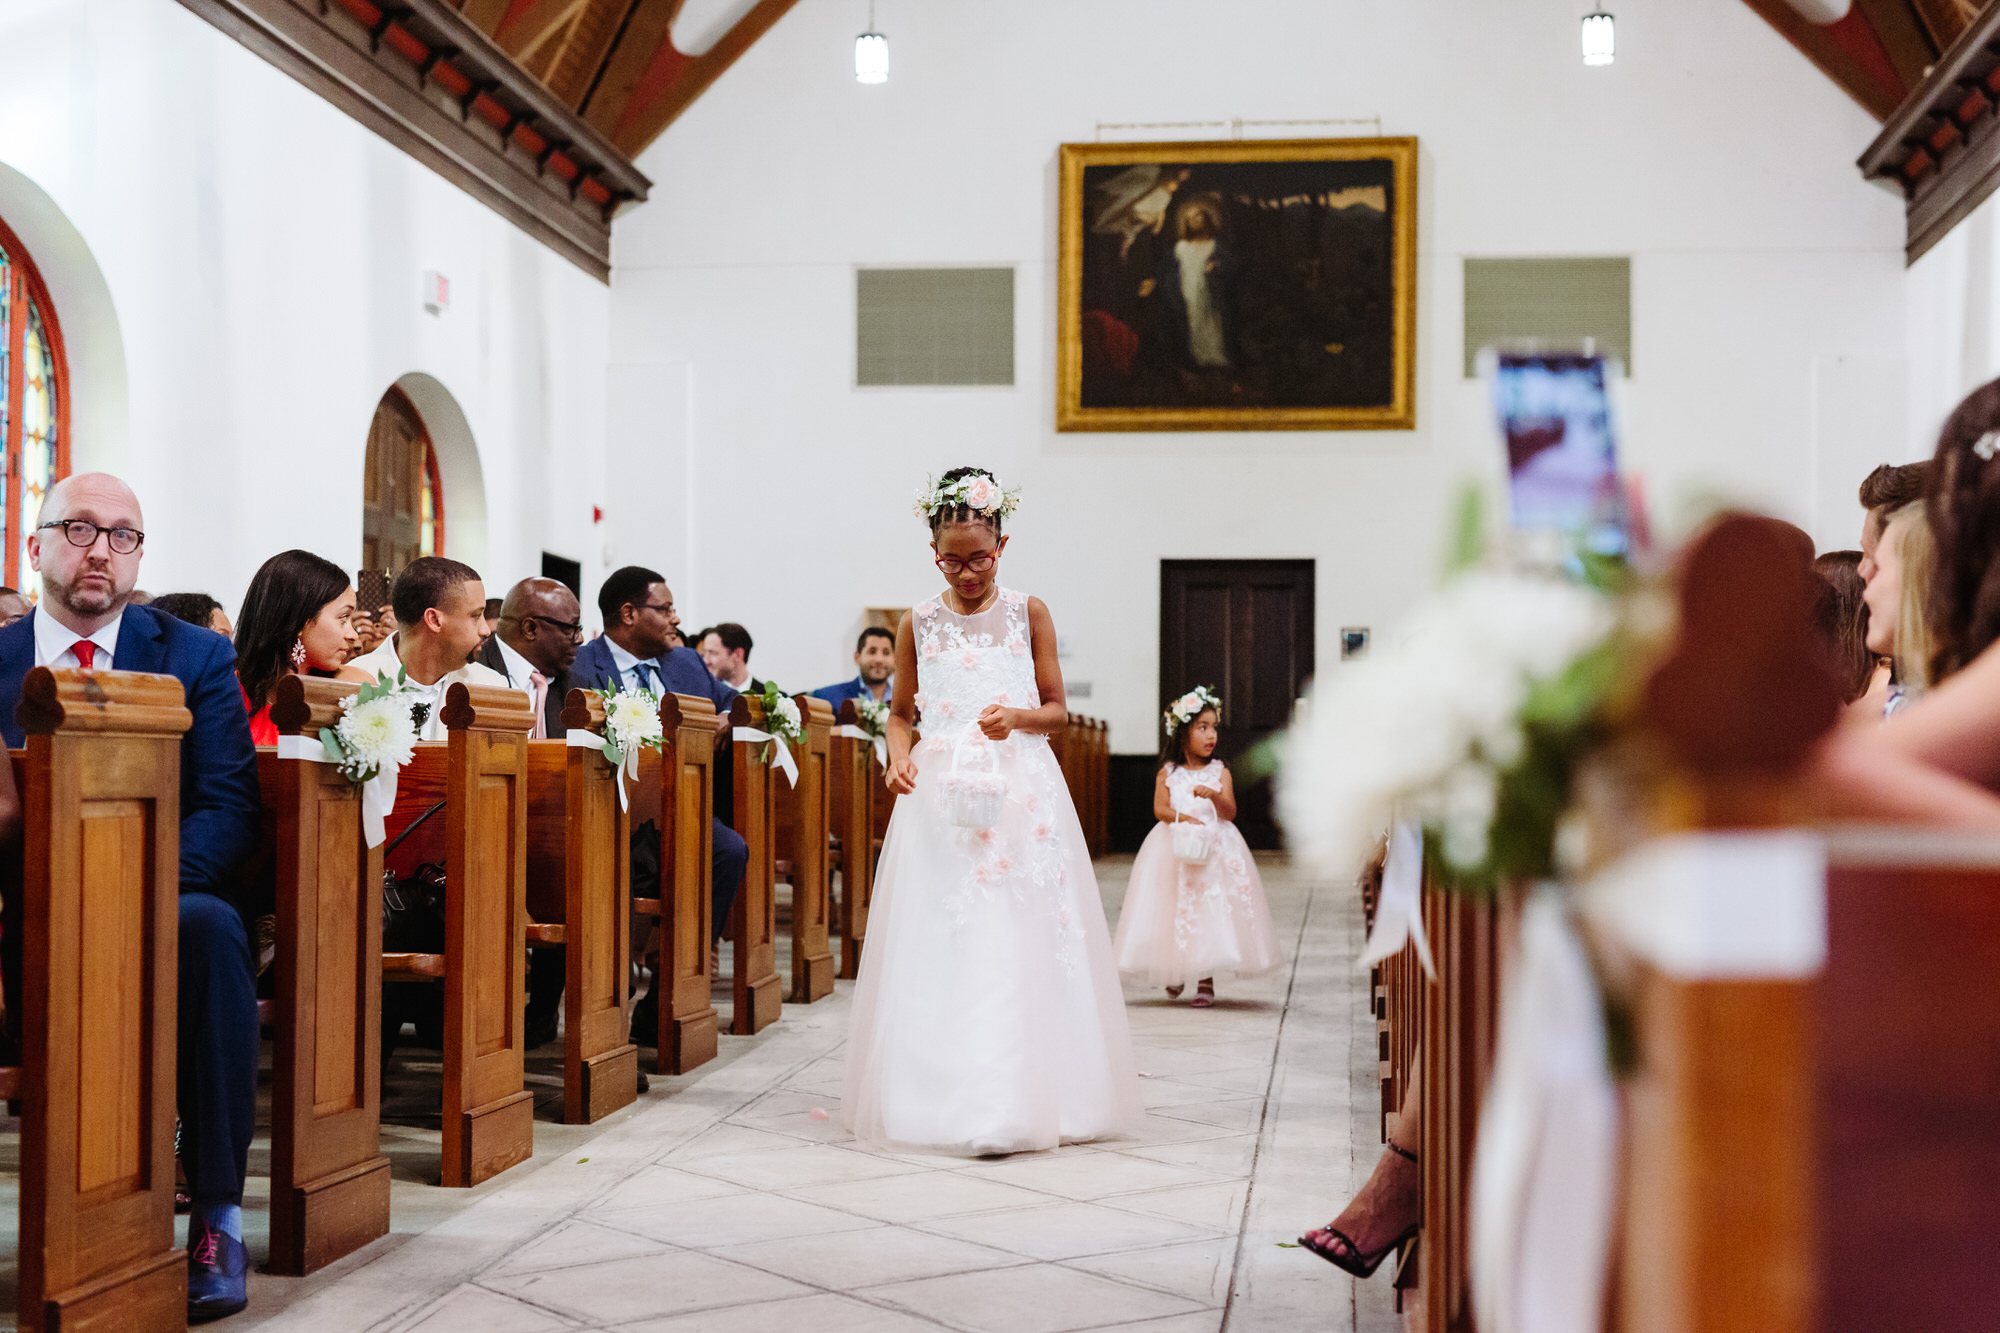 st-lukes-chapel-cannon-green-charleston-wedding-913.JPG